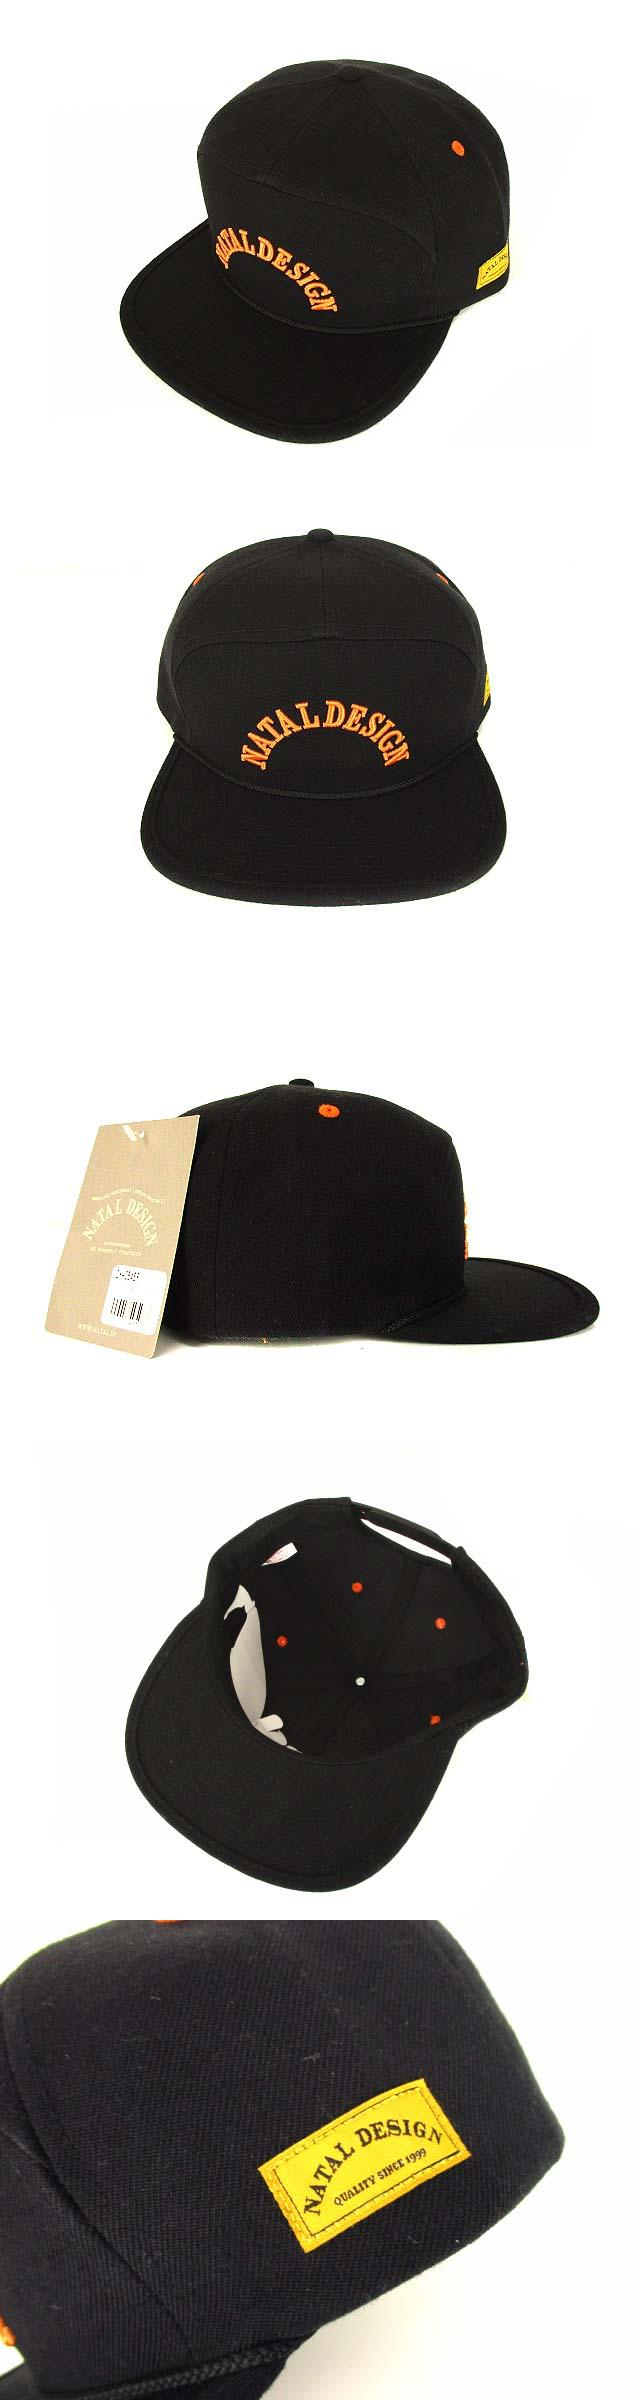 GOOD BOY CAP TWILL 20/80 キャップ 帽子 刺繍 アクリル ウール 黒 オレンジ F